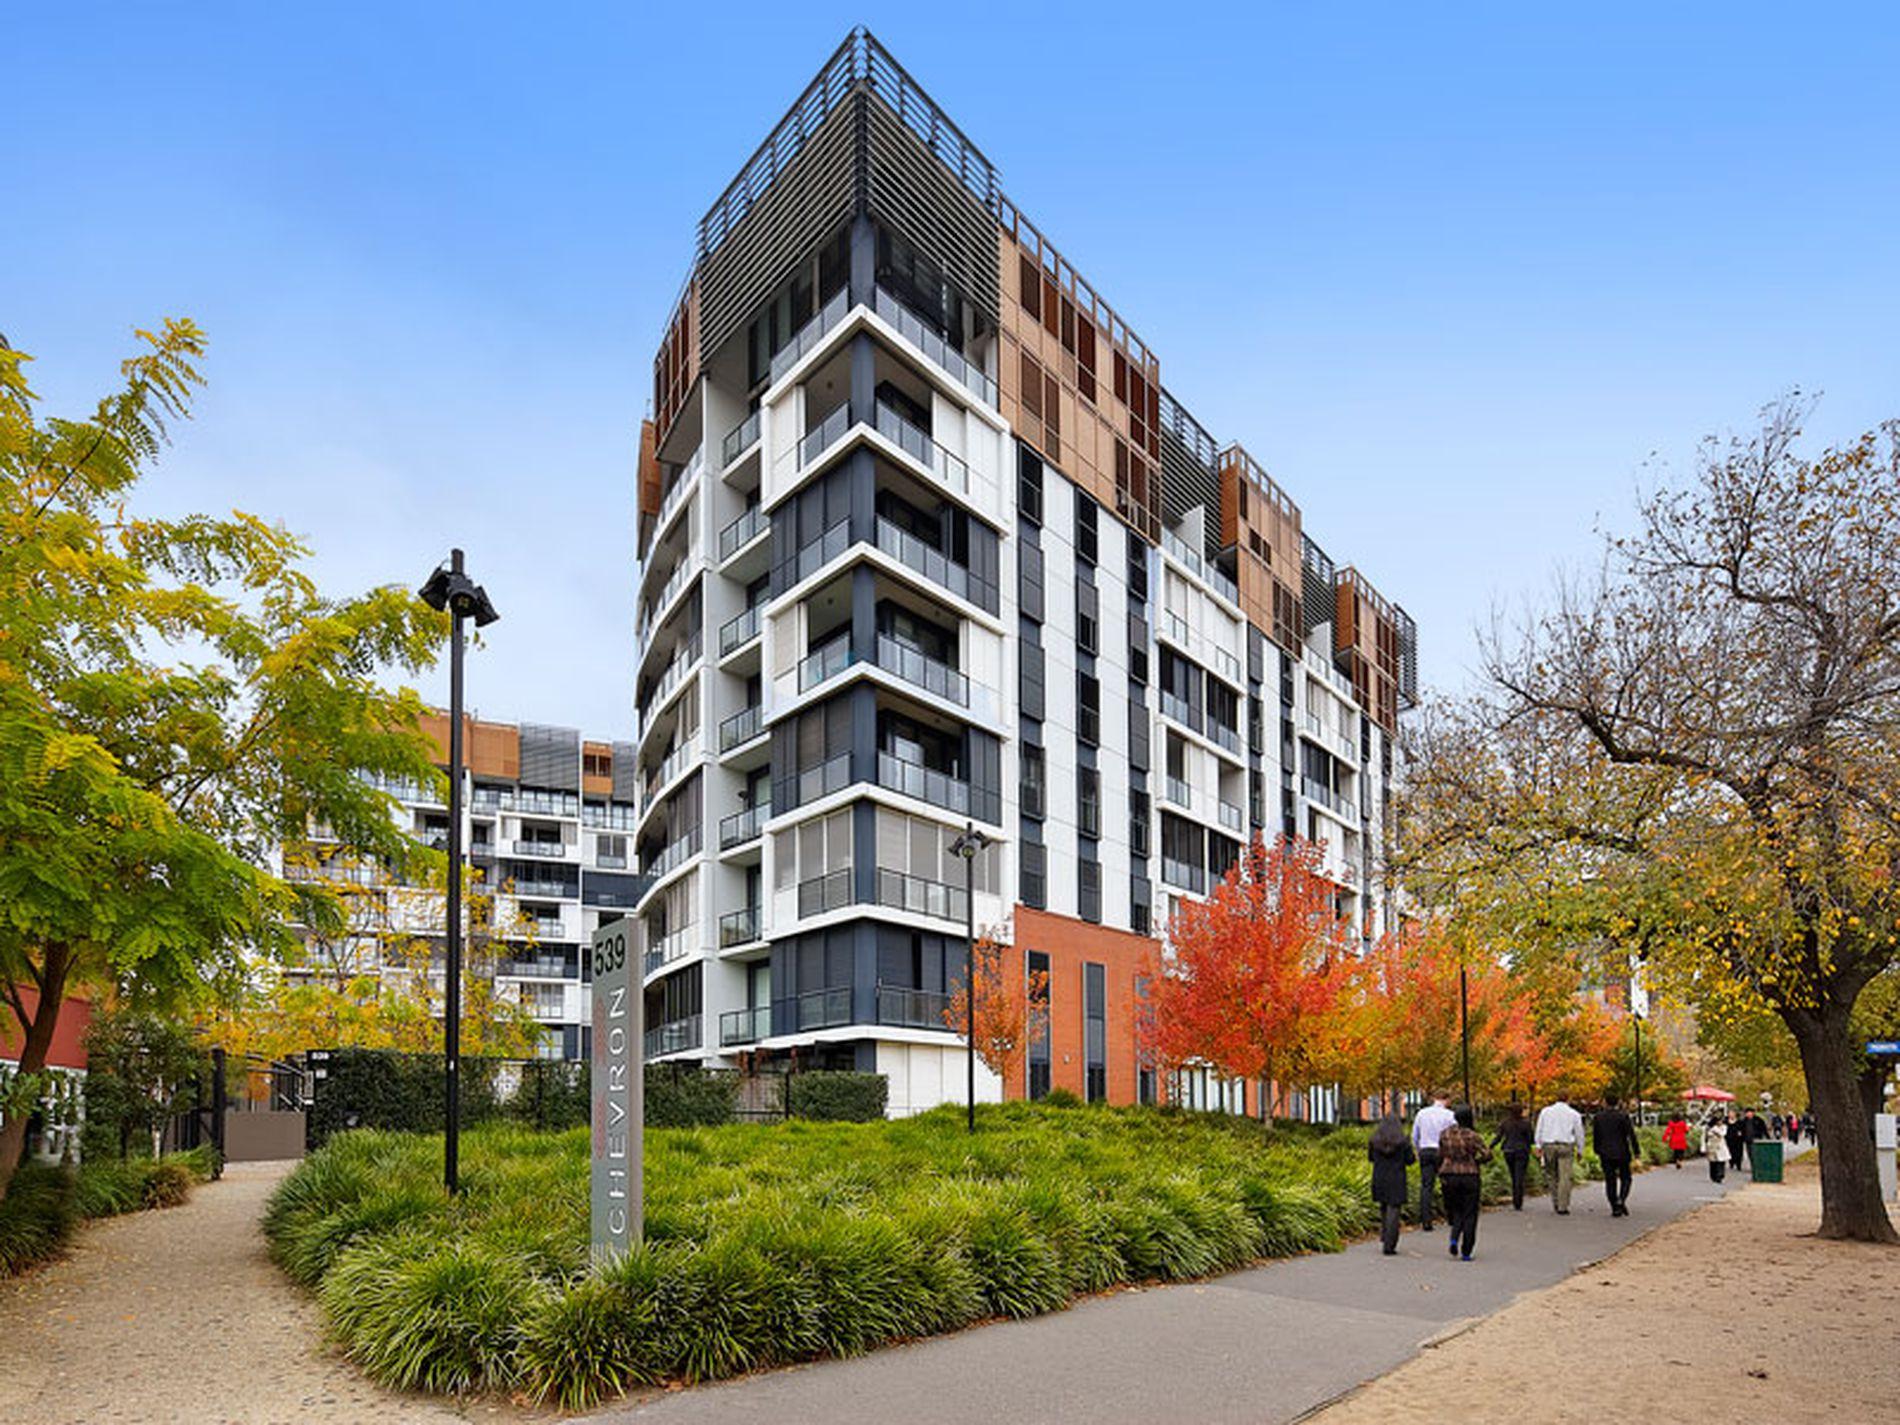 431 / 539 St Kilda Road, Melbourne